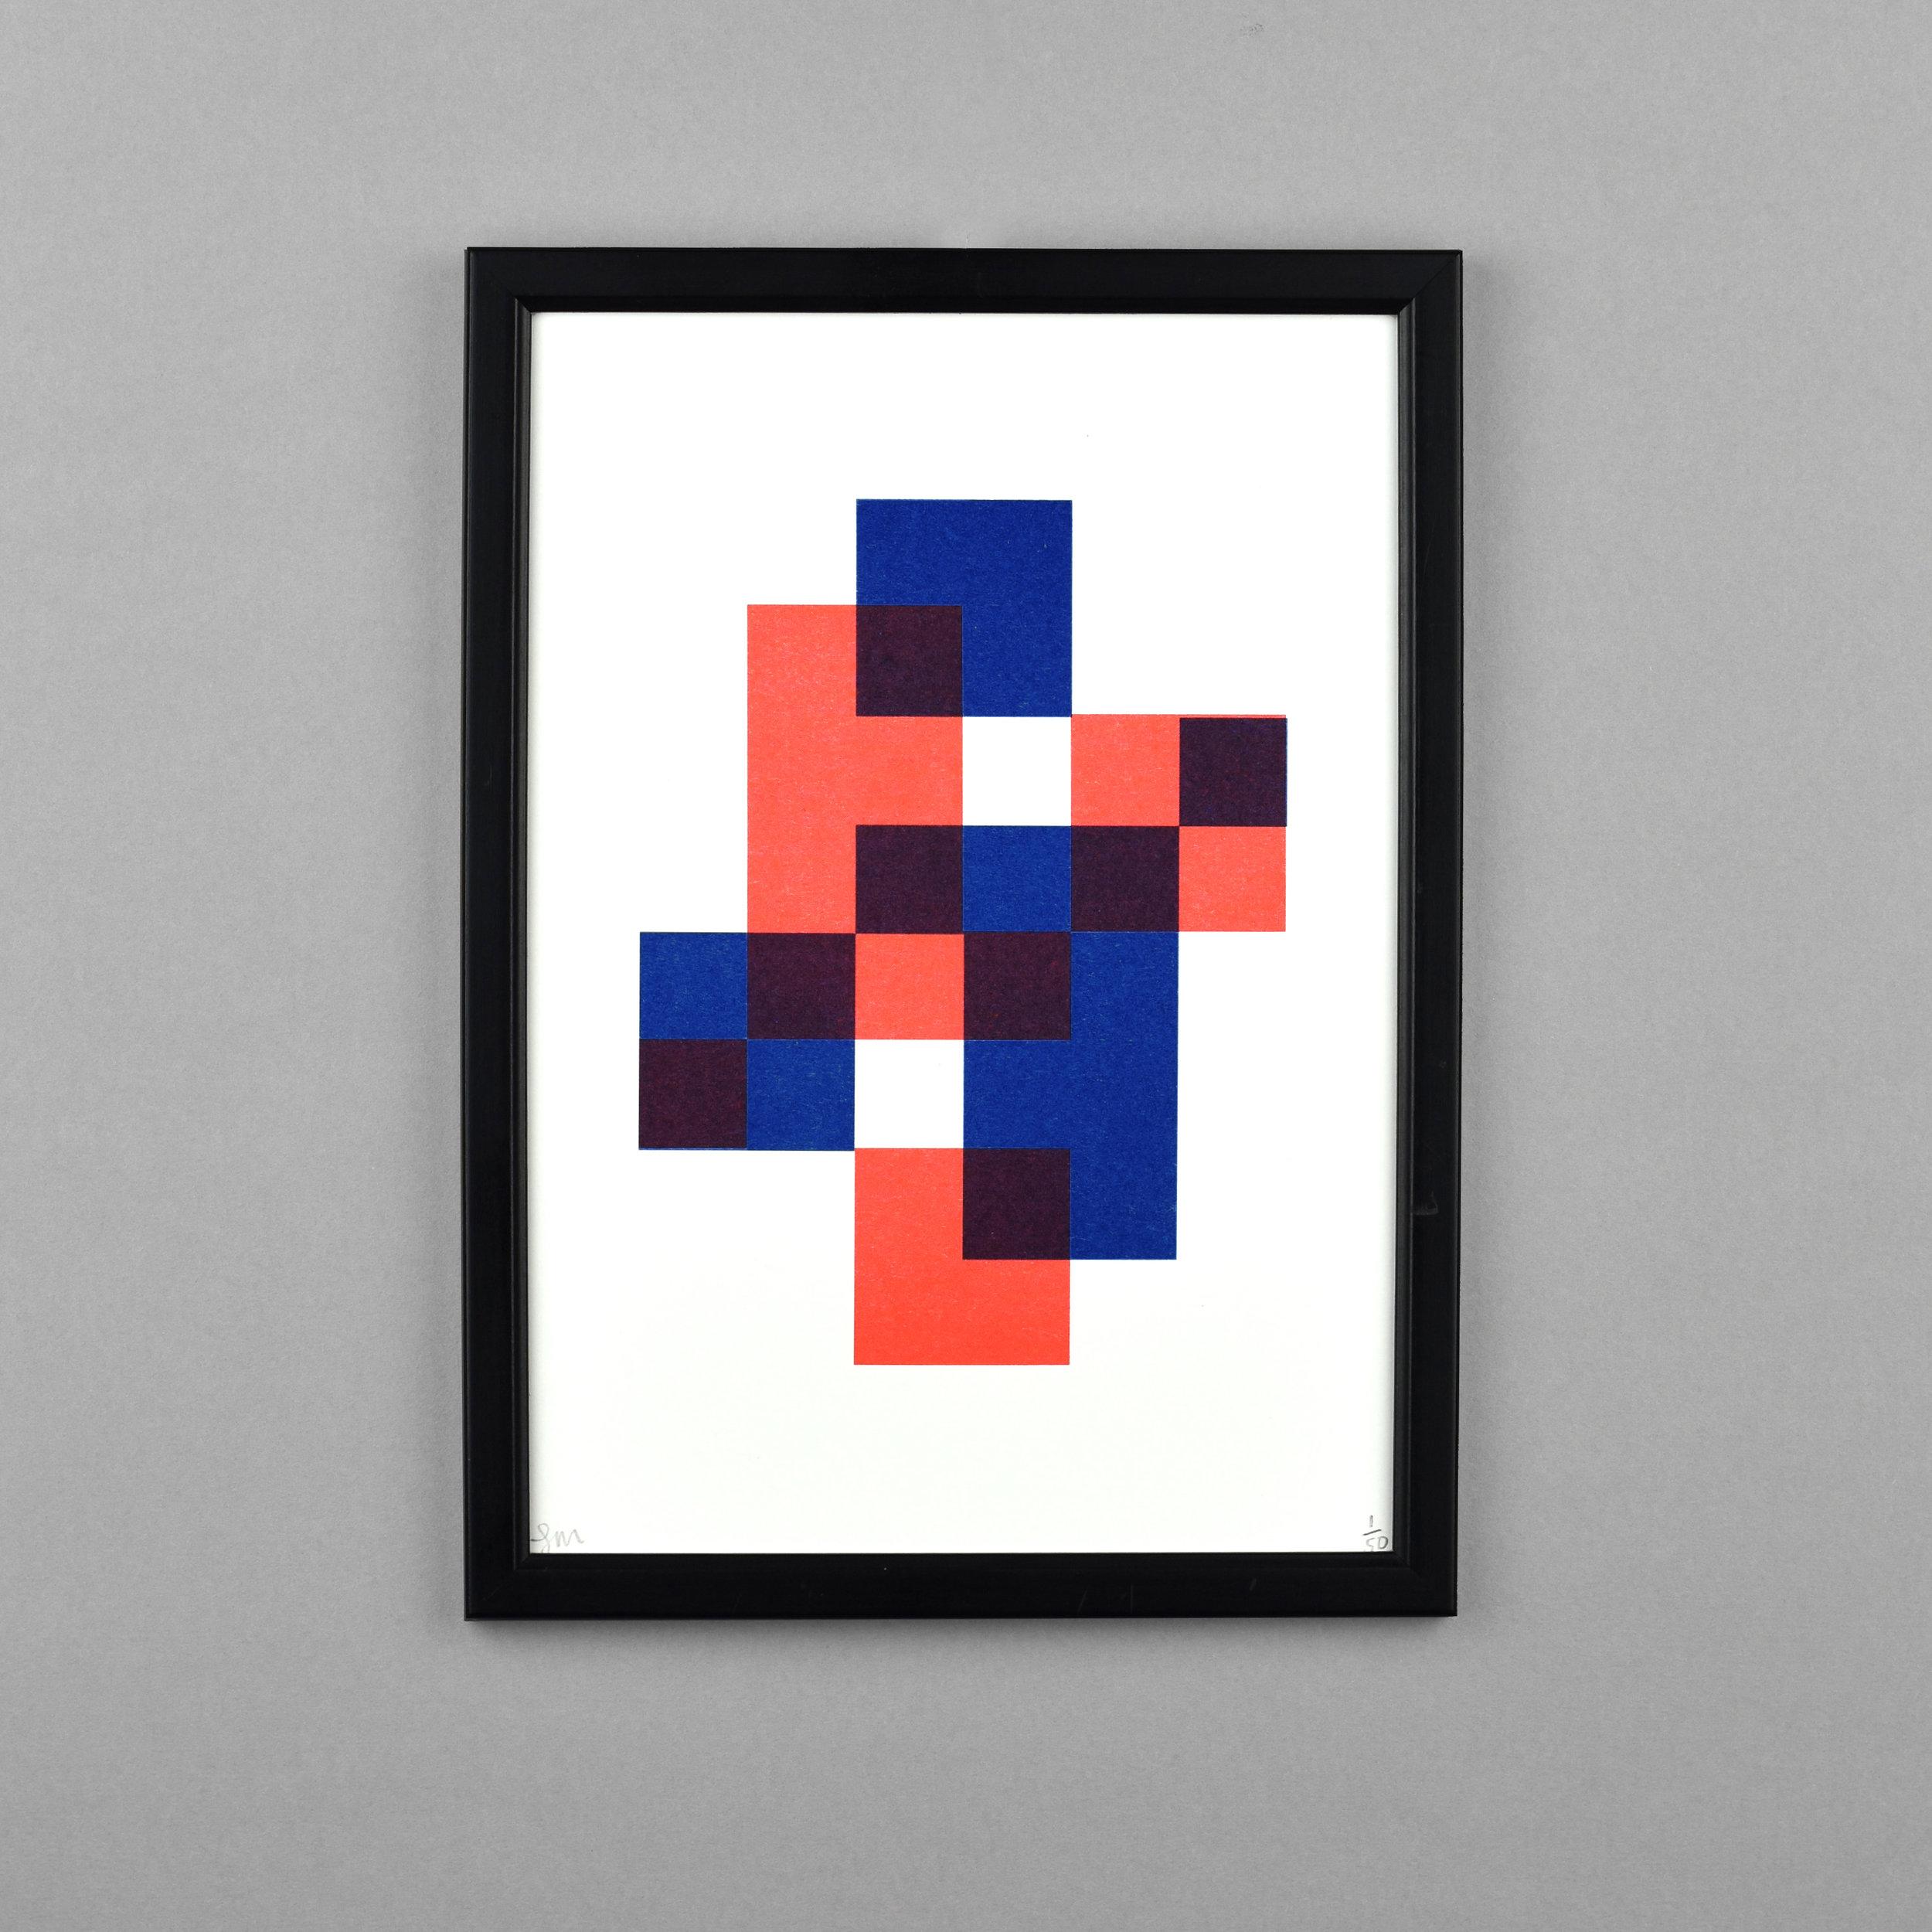 thepatternguild_riso_print_overlay_pattern1.jpg